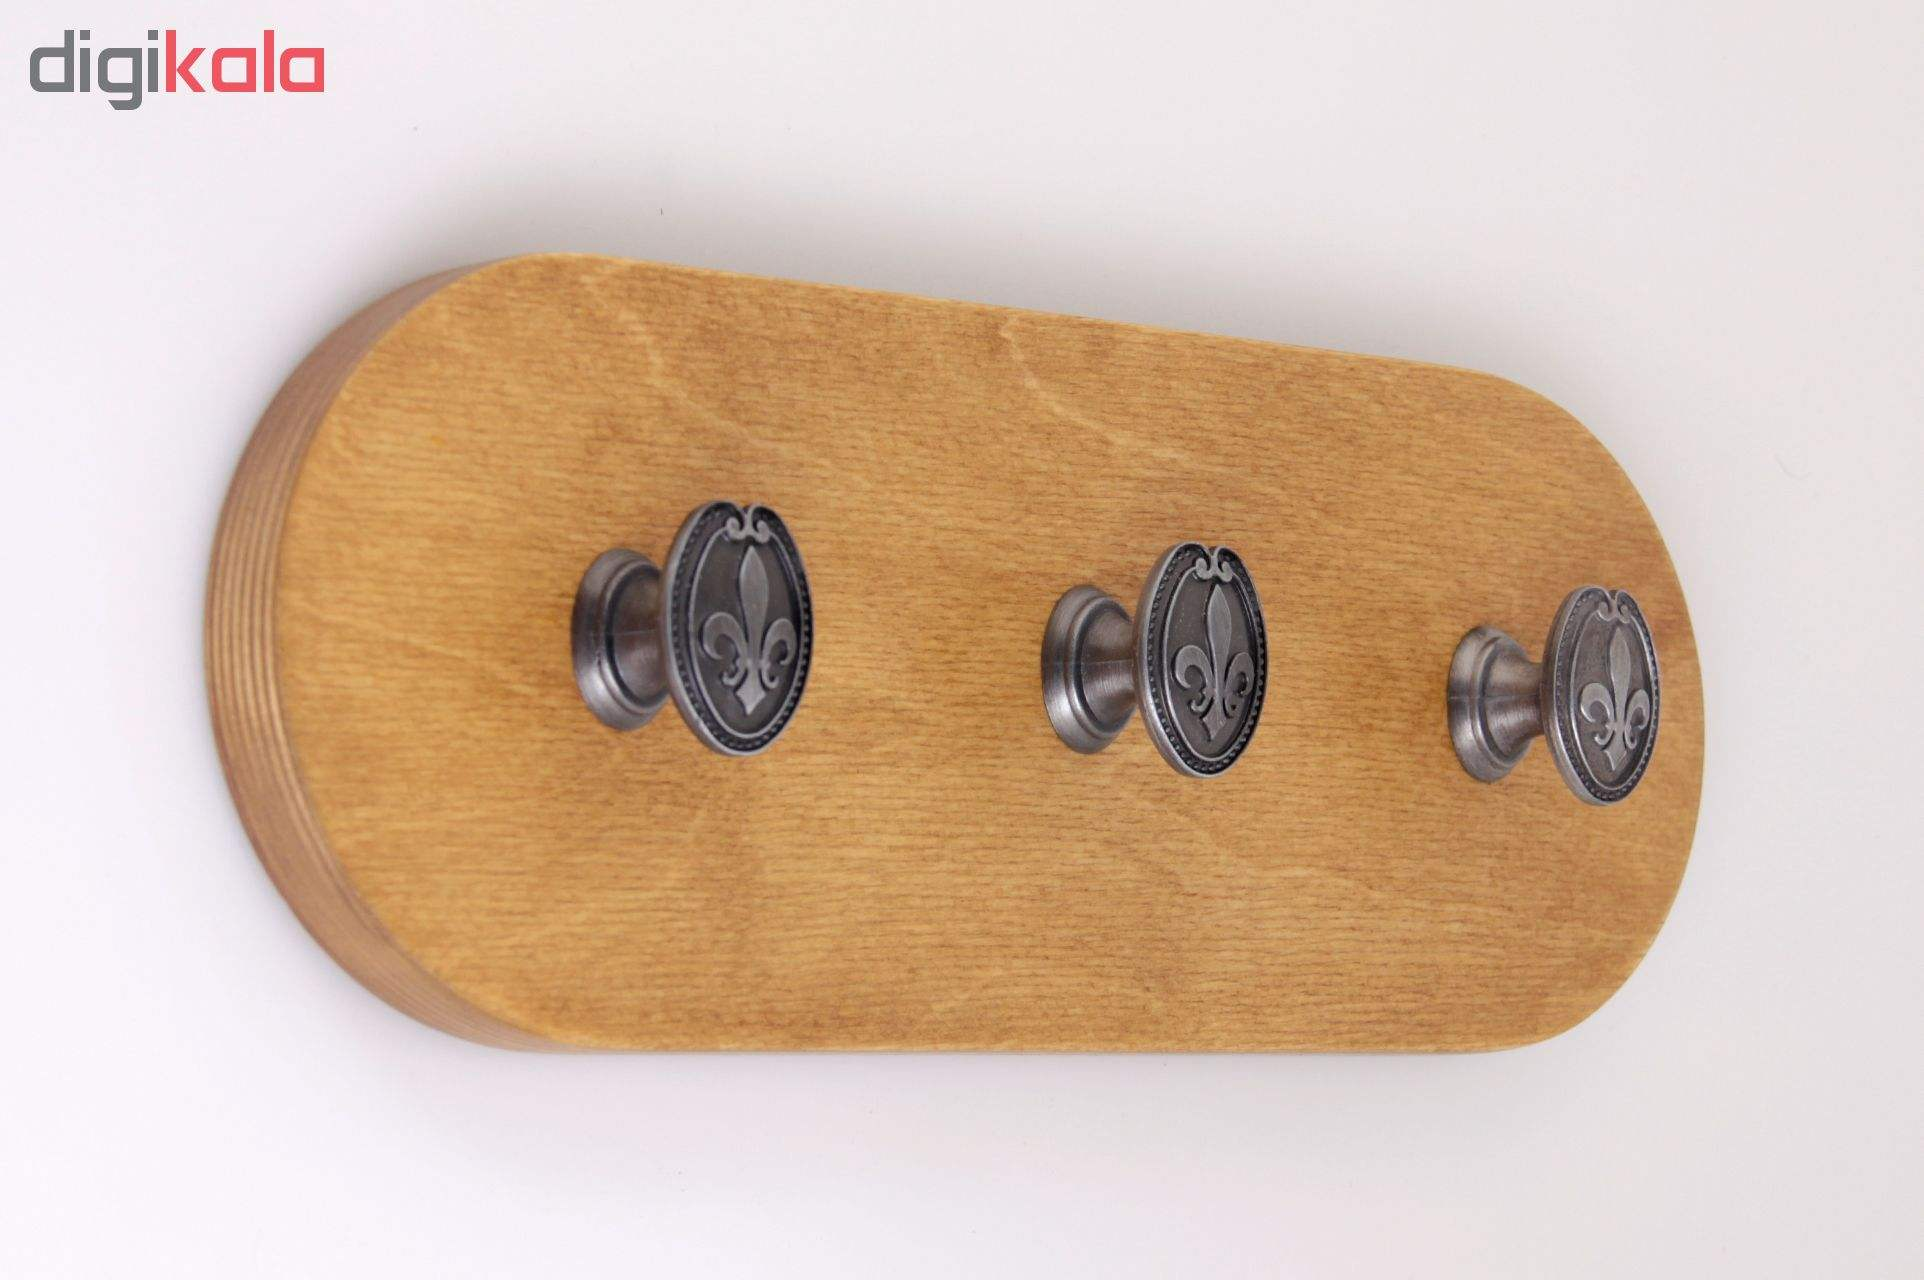 آویز لباس ریتون مدل Anchor-S3 main 1 3